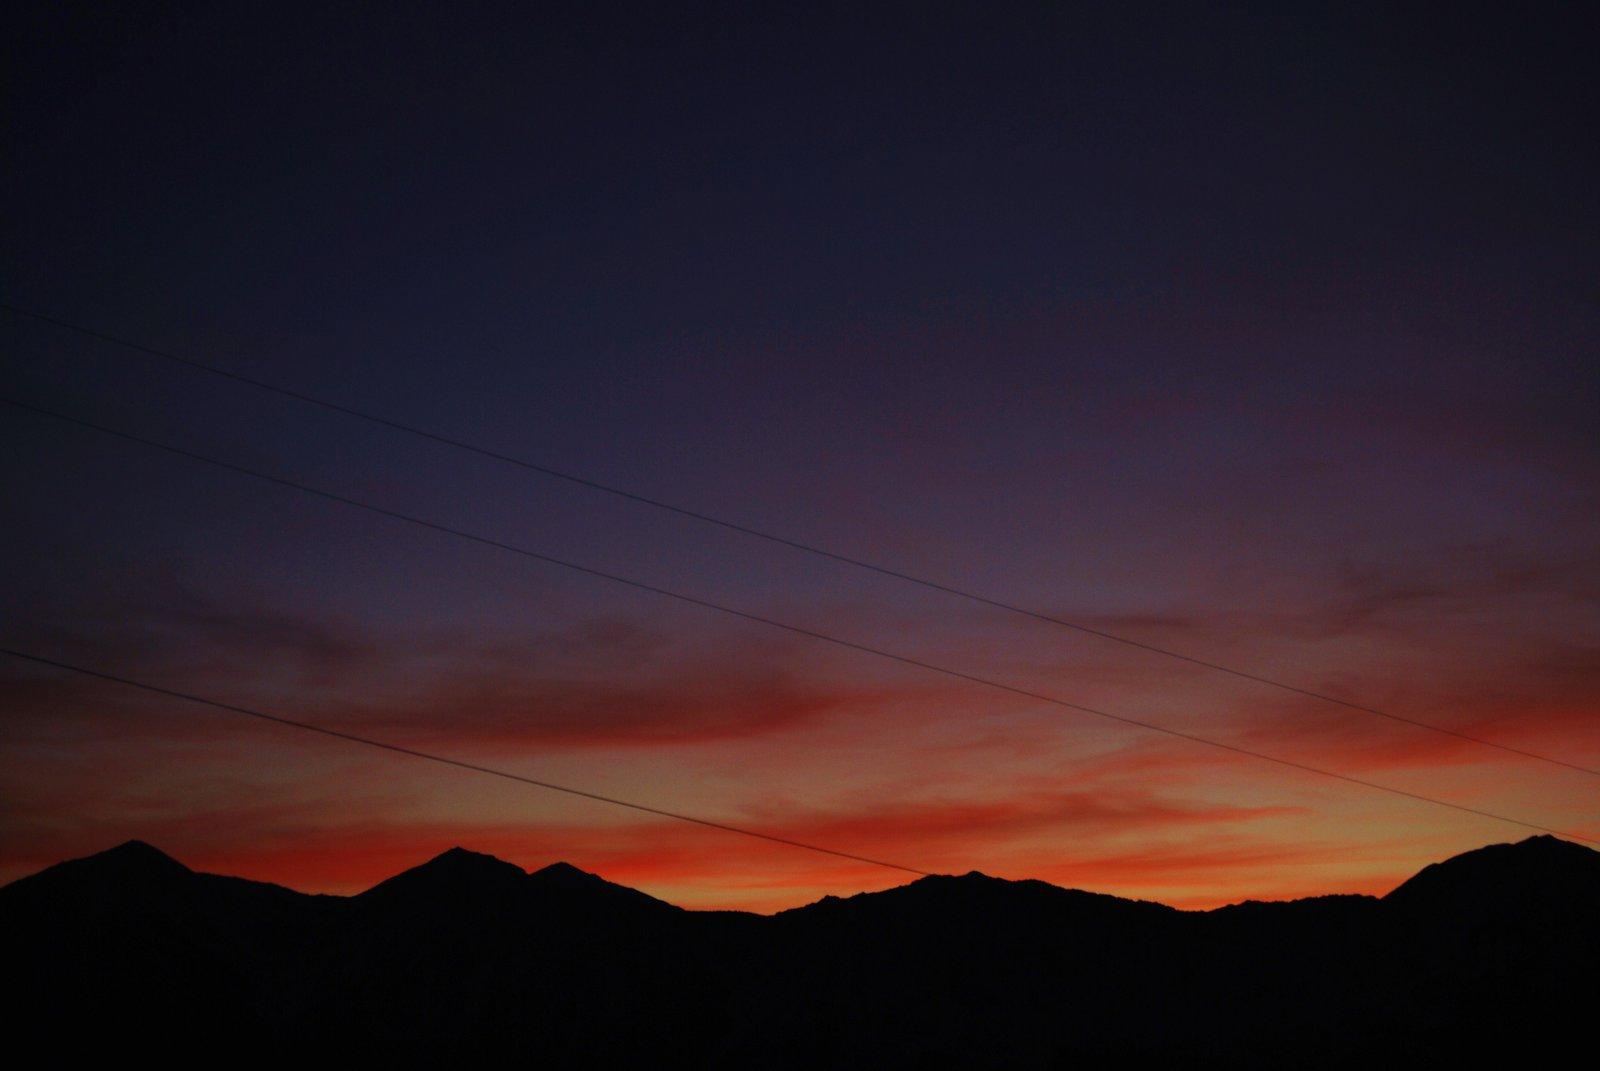 Sunset over the Sierra Nevada Mts.